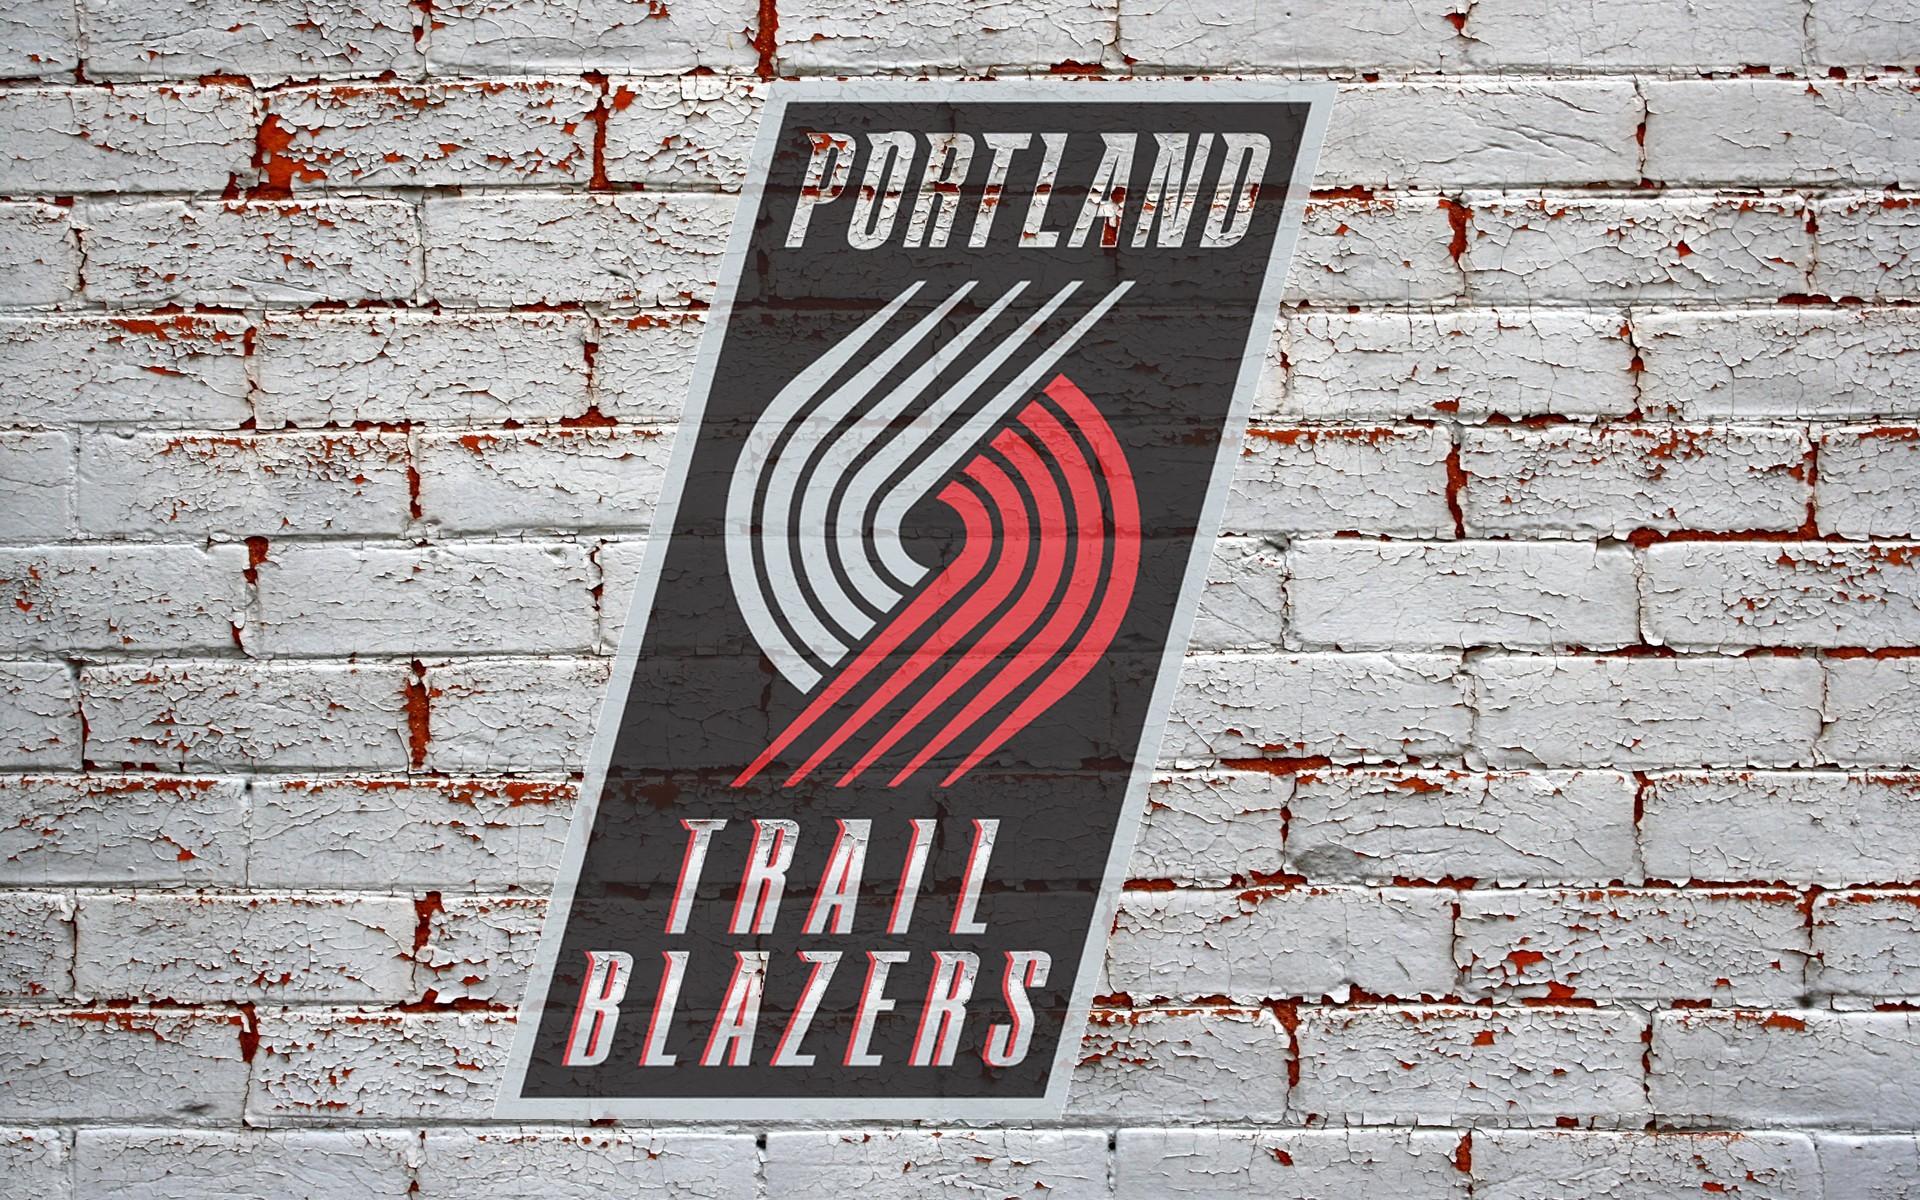 Portland Trail Blazers Logo wallpaper   897229 1920x1200